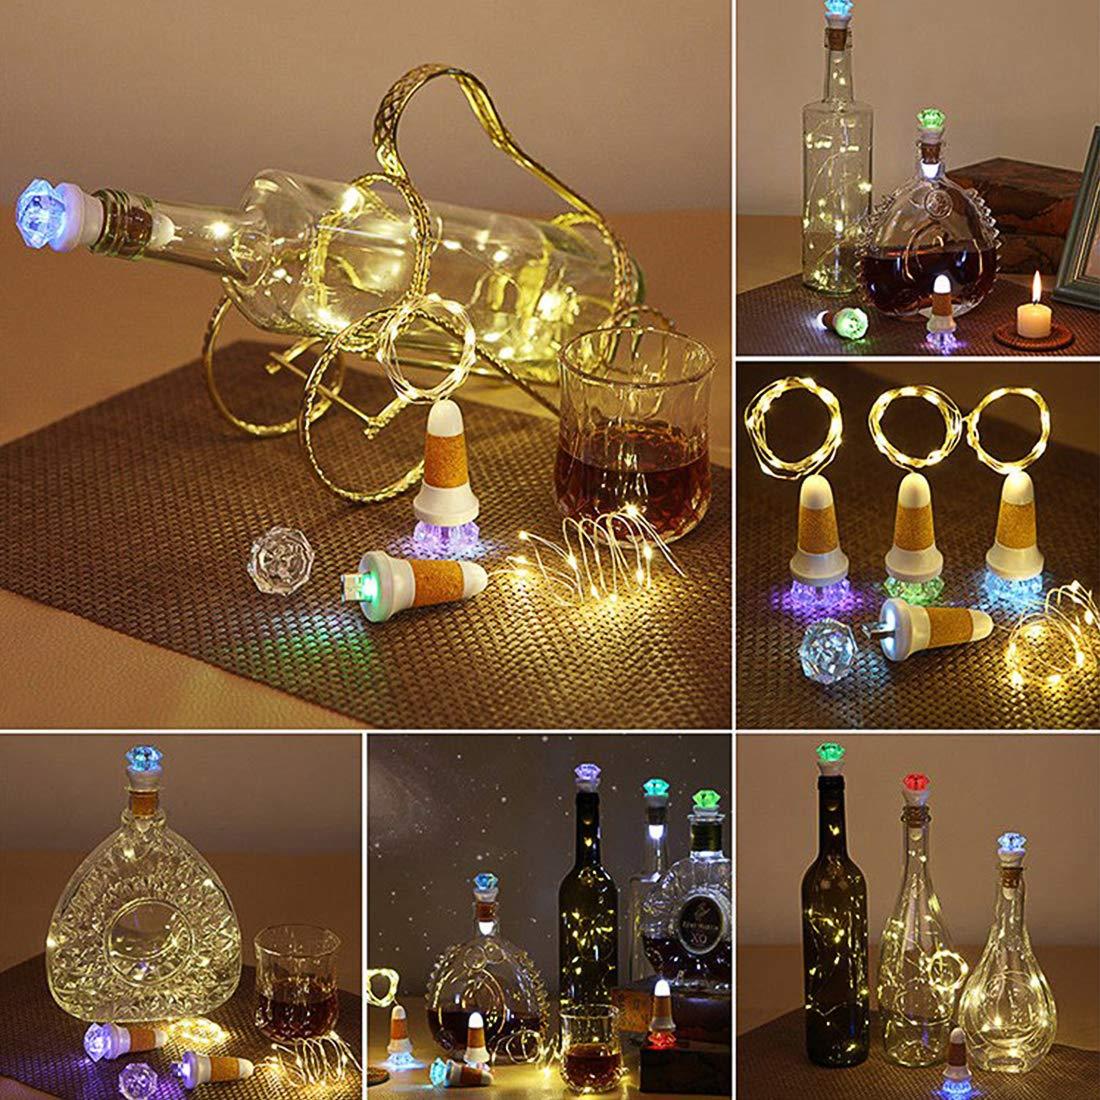 Neloodony Luz de Botella,Corcho Botella Luces, Lámparas de Botellas USB con Recargable,LED Luces para Botella para el hogar,jardín,terraza, Boda y Fiesta de ...